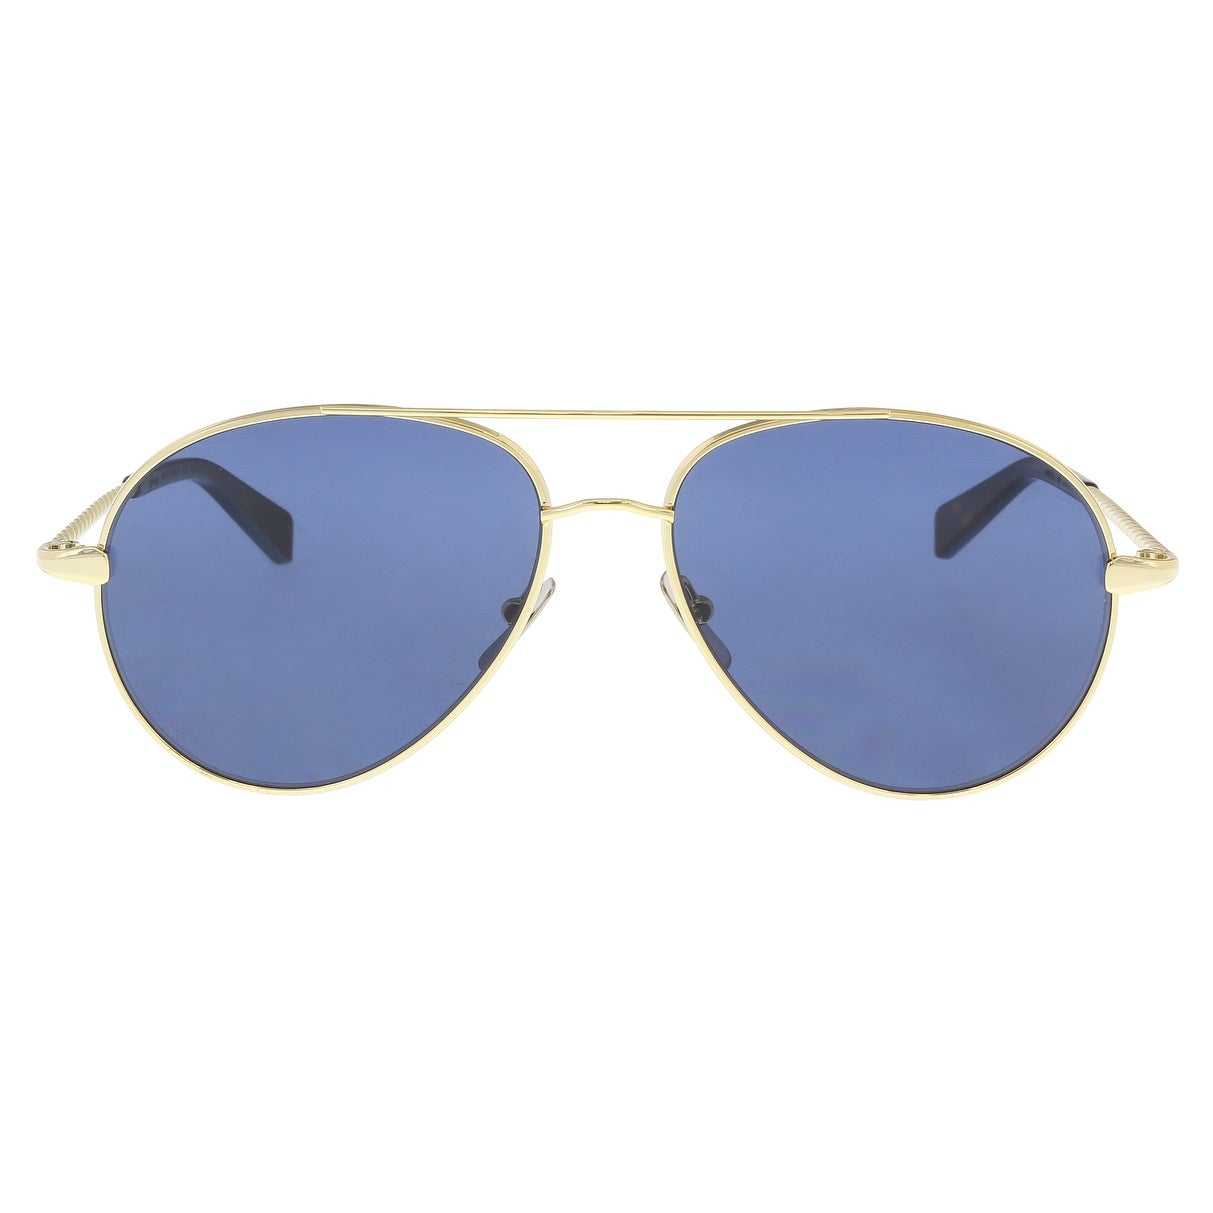 8e76a93e5b Shop Brioni BR0034S-003 Gold Aviator Sunglasses - 67-15-145 - Free Shipping  Today - Overstock - 21158387